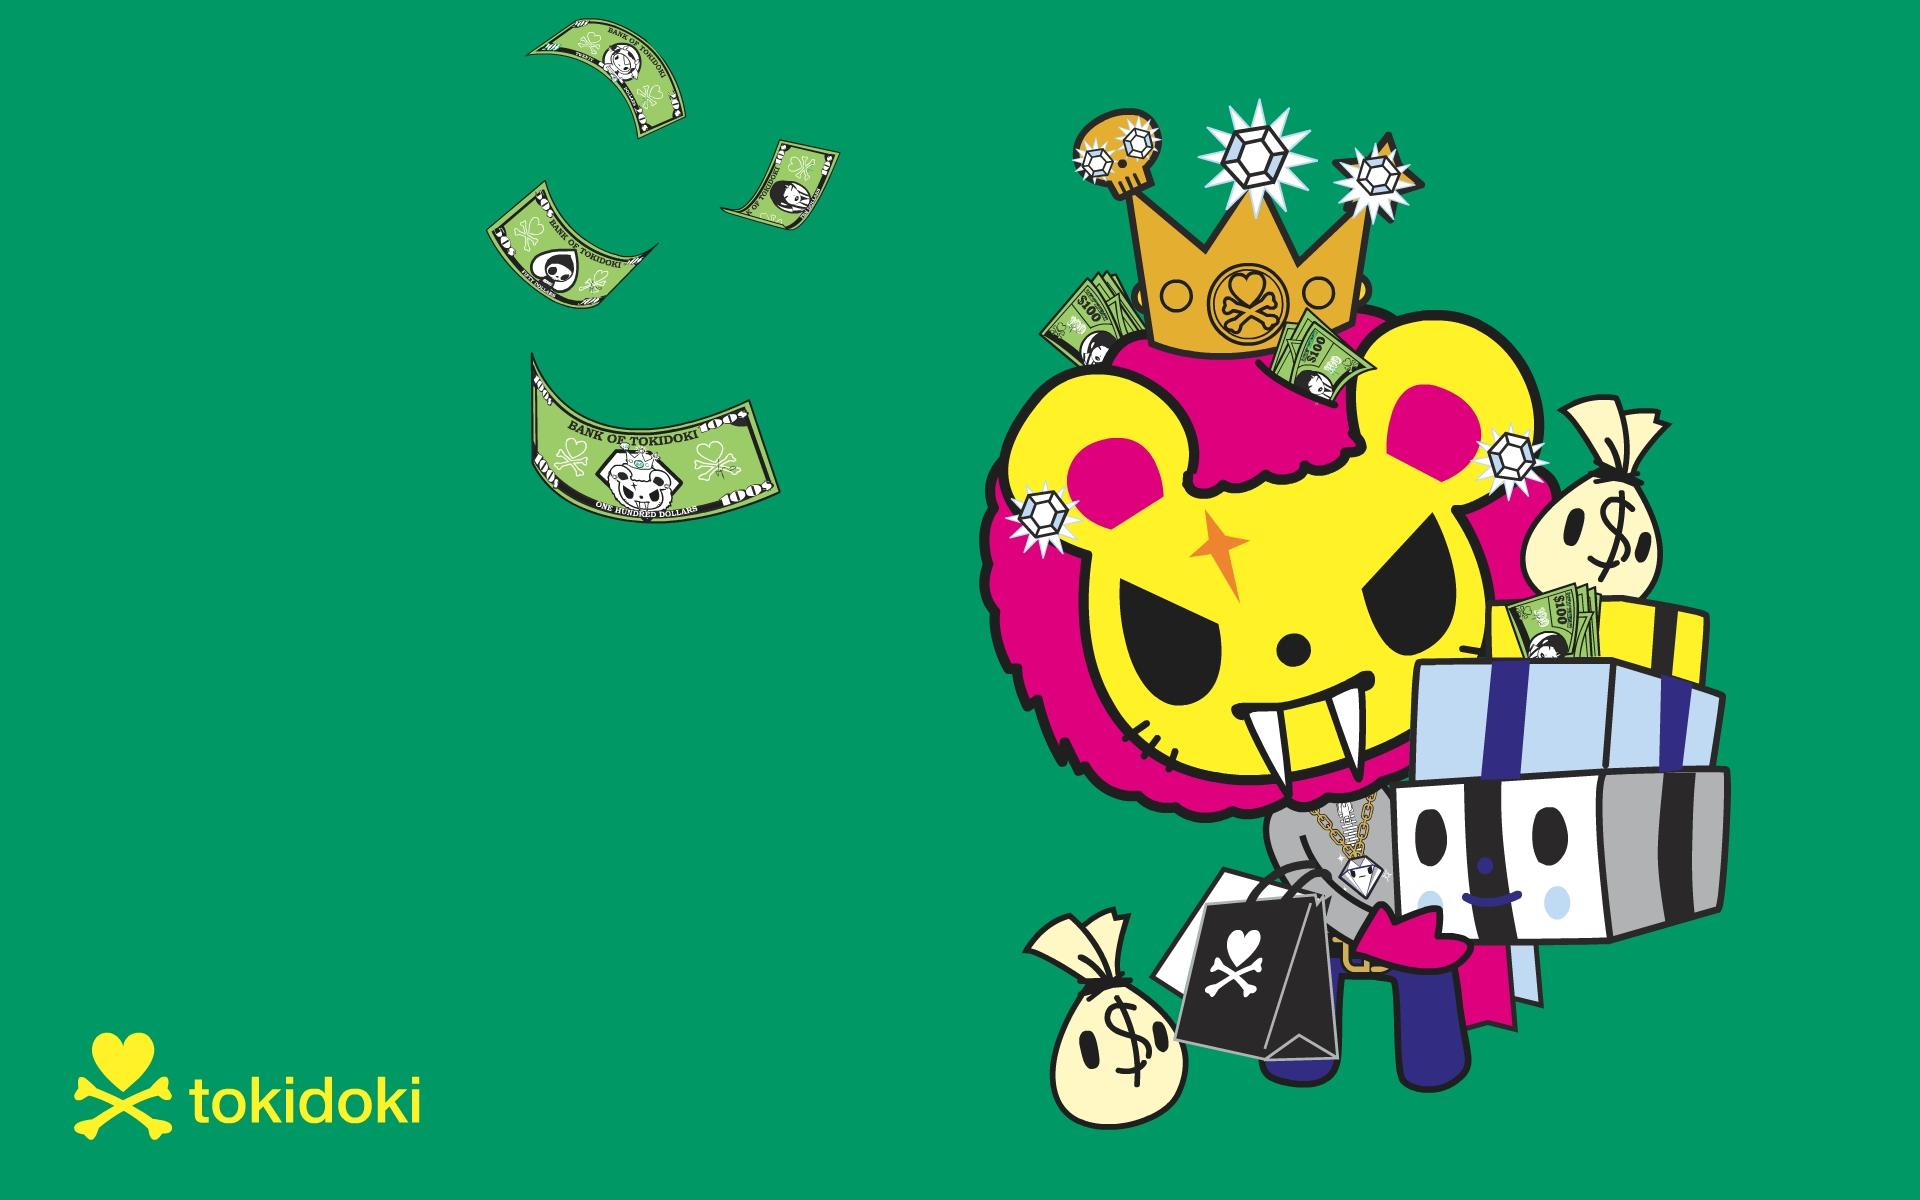 Happy New Year 2016 Quotes Wallpapers Tokidoki Wallpapers Download Free Pixelstalk Net